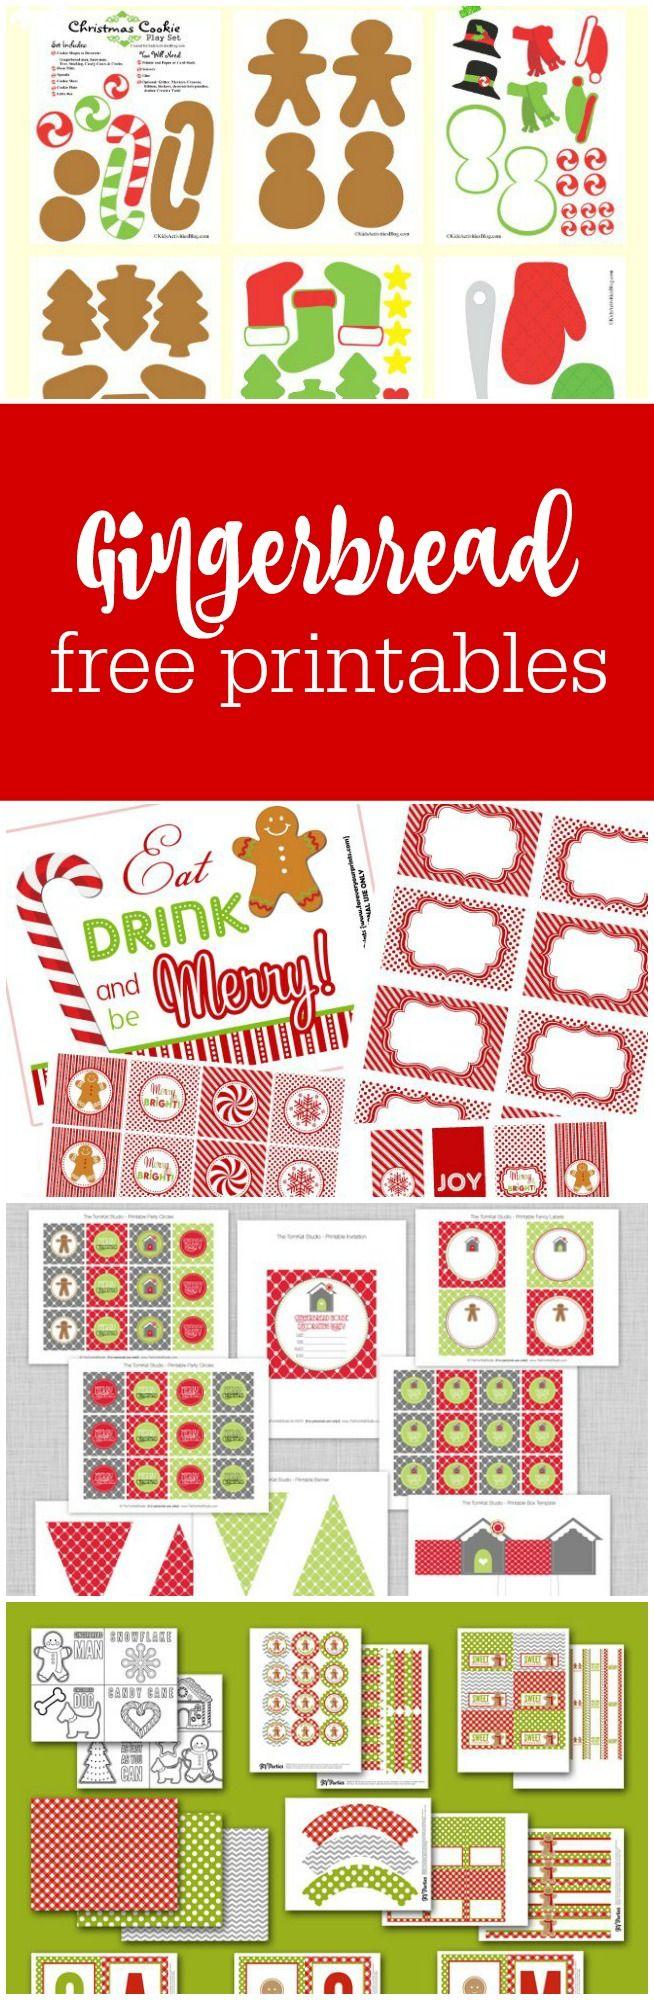 Gingerbread house free printables - Freebie Friday Gingerbread Party Printables